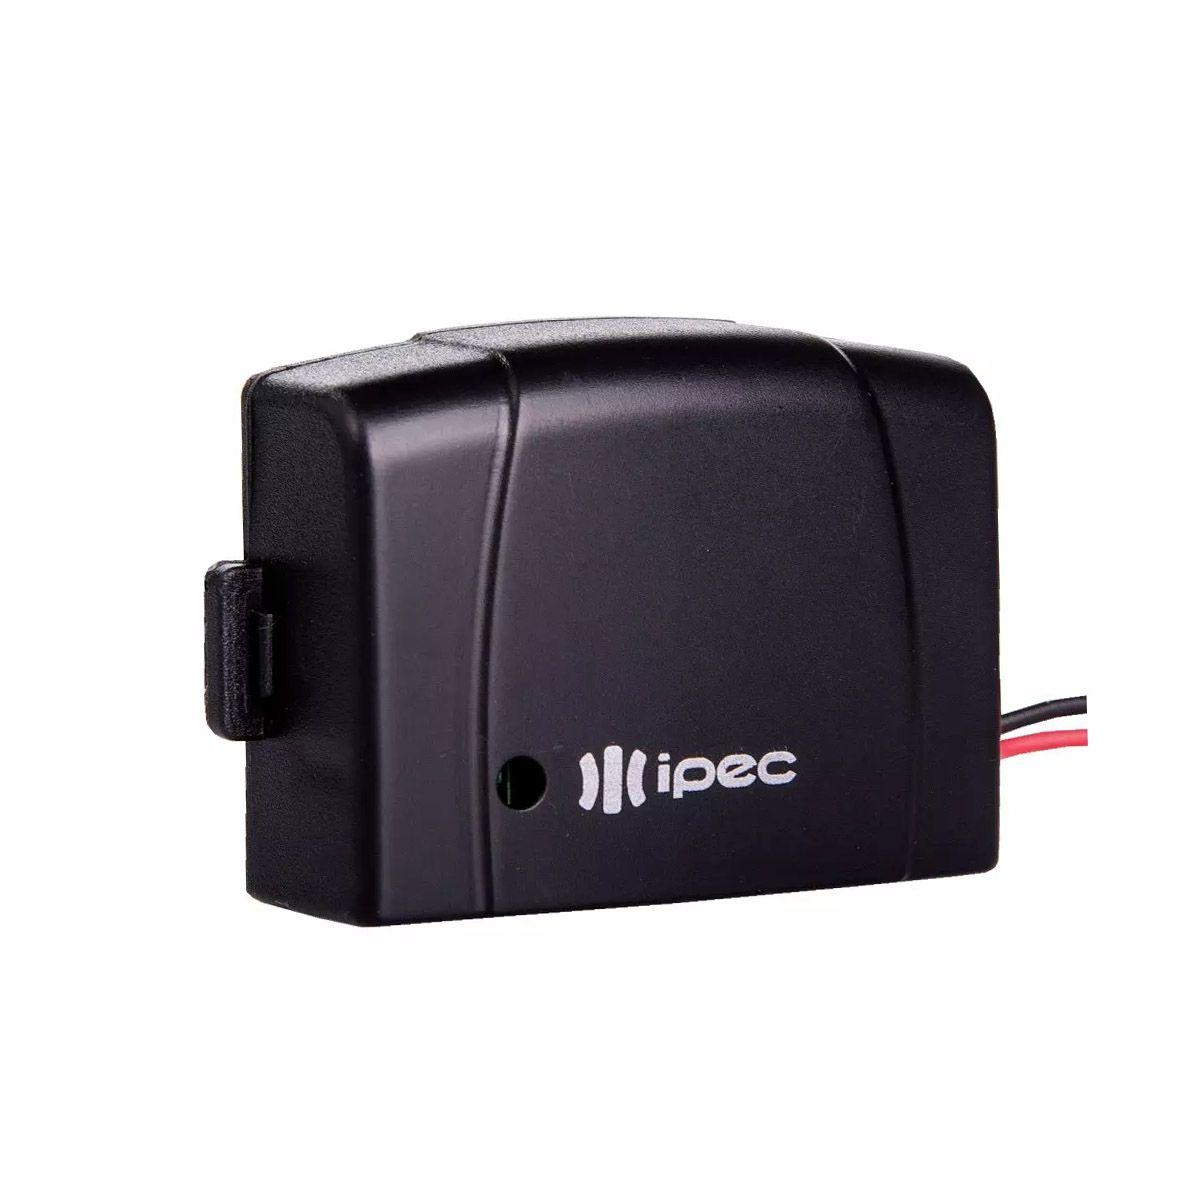 2pcs Controle Veicular Ppa Garen Motor Portao Farol Saw